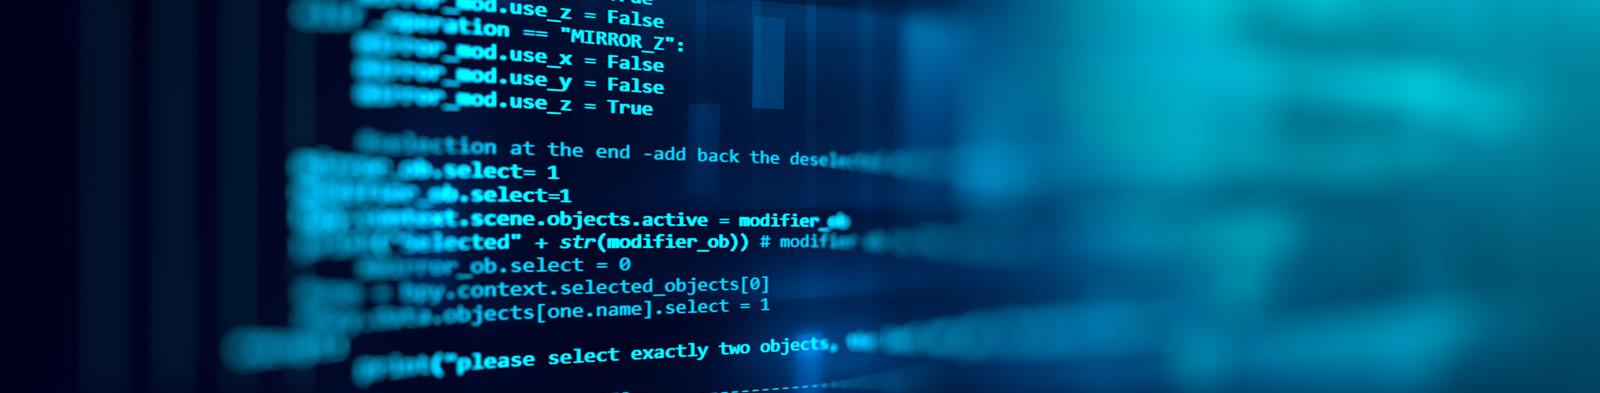 Software code illuminated